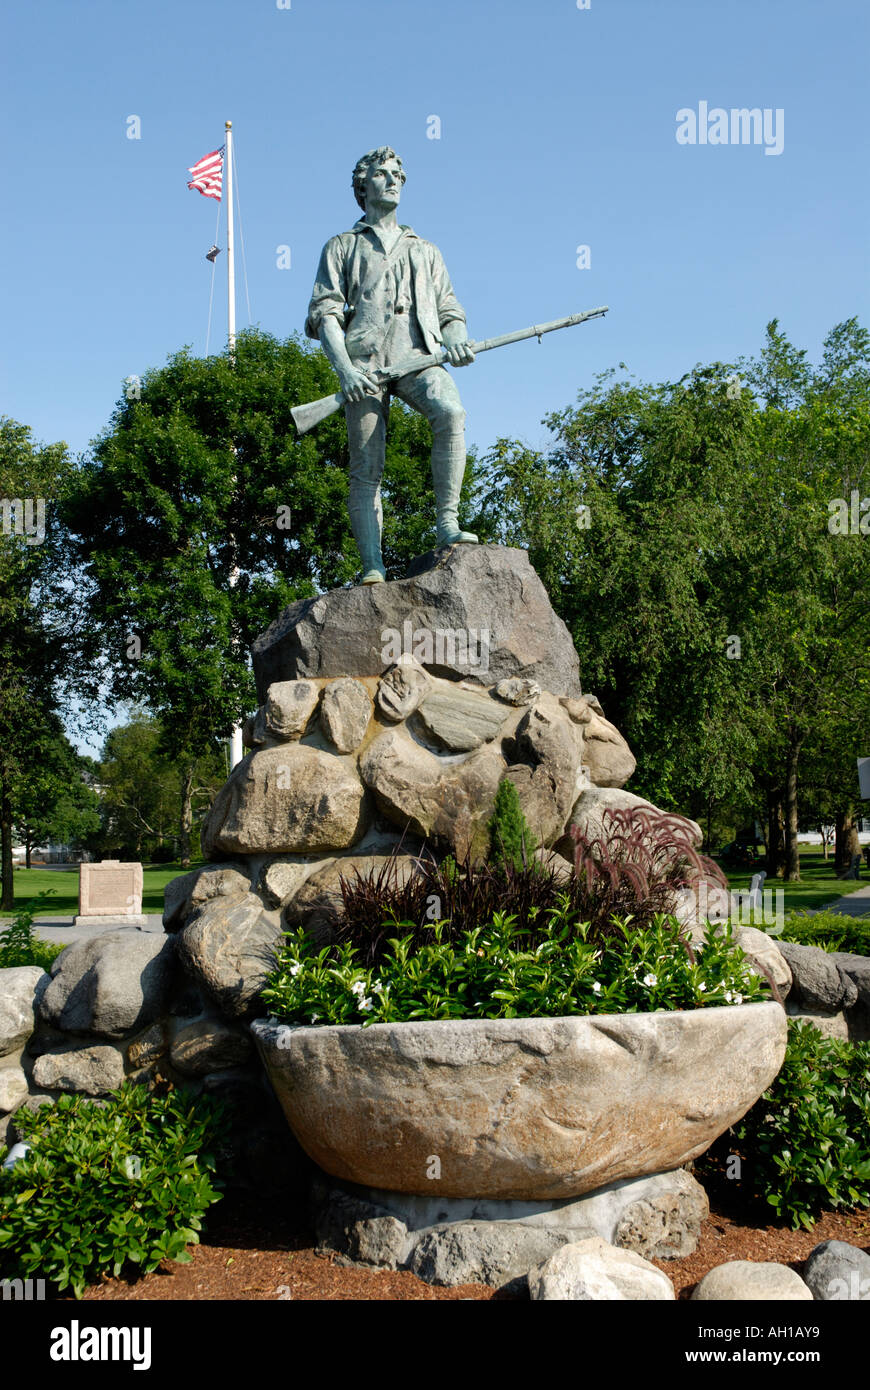 Memorial statue of Captain John Parker at Lexington Battle Green site of the beginning of the American Revolution Stock Photo